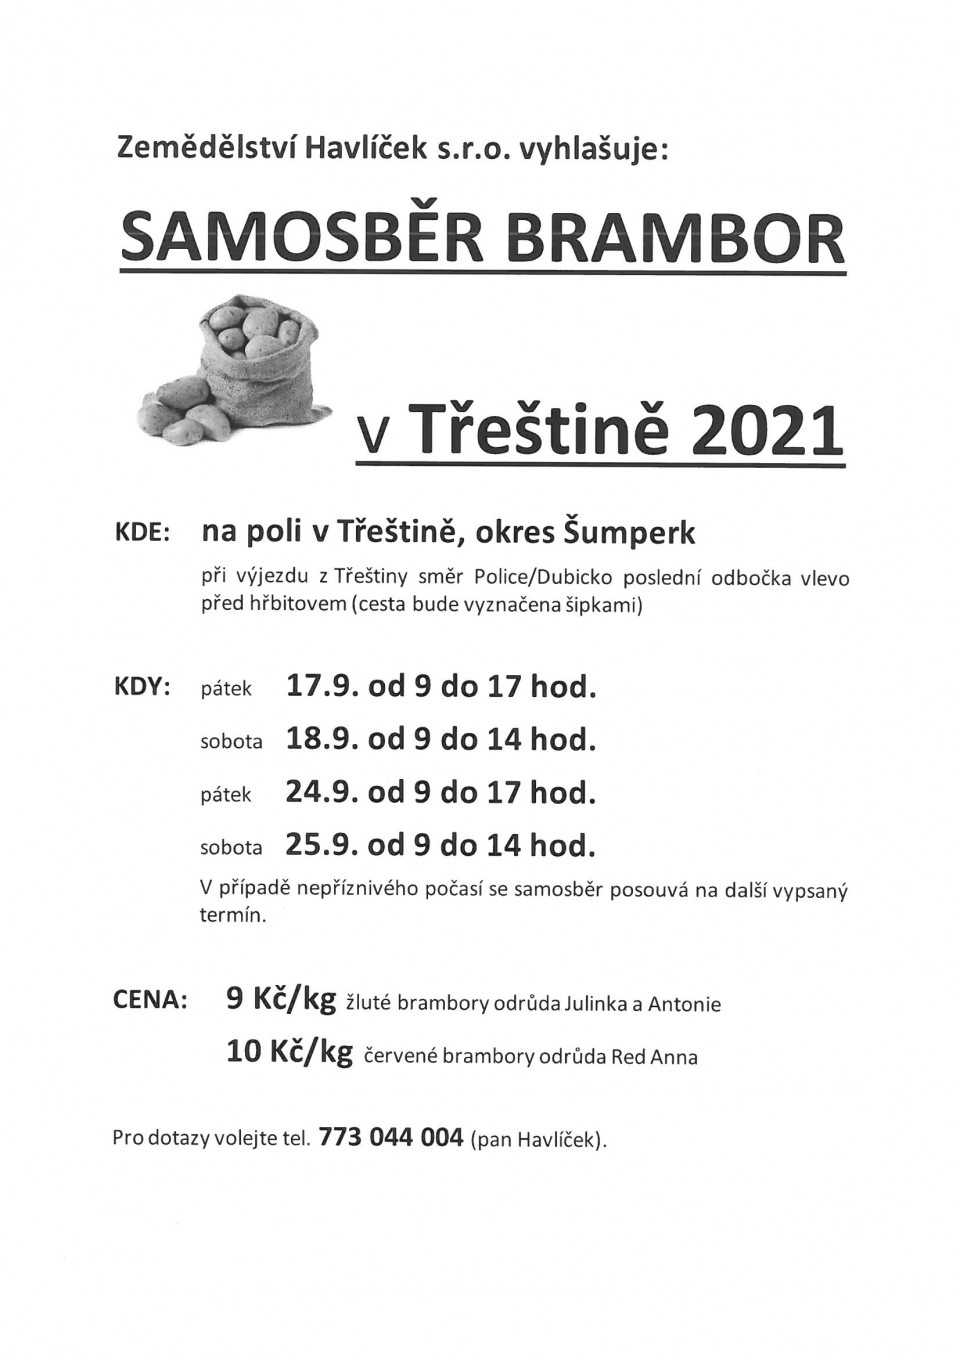 samosber-brambor-v-trestine-2021